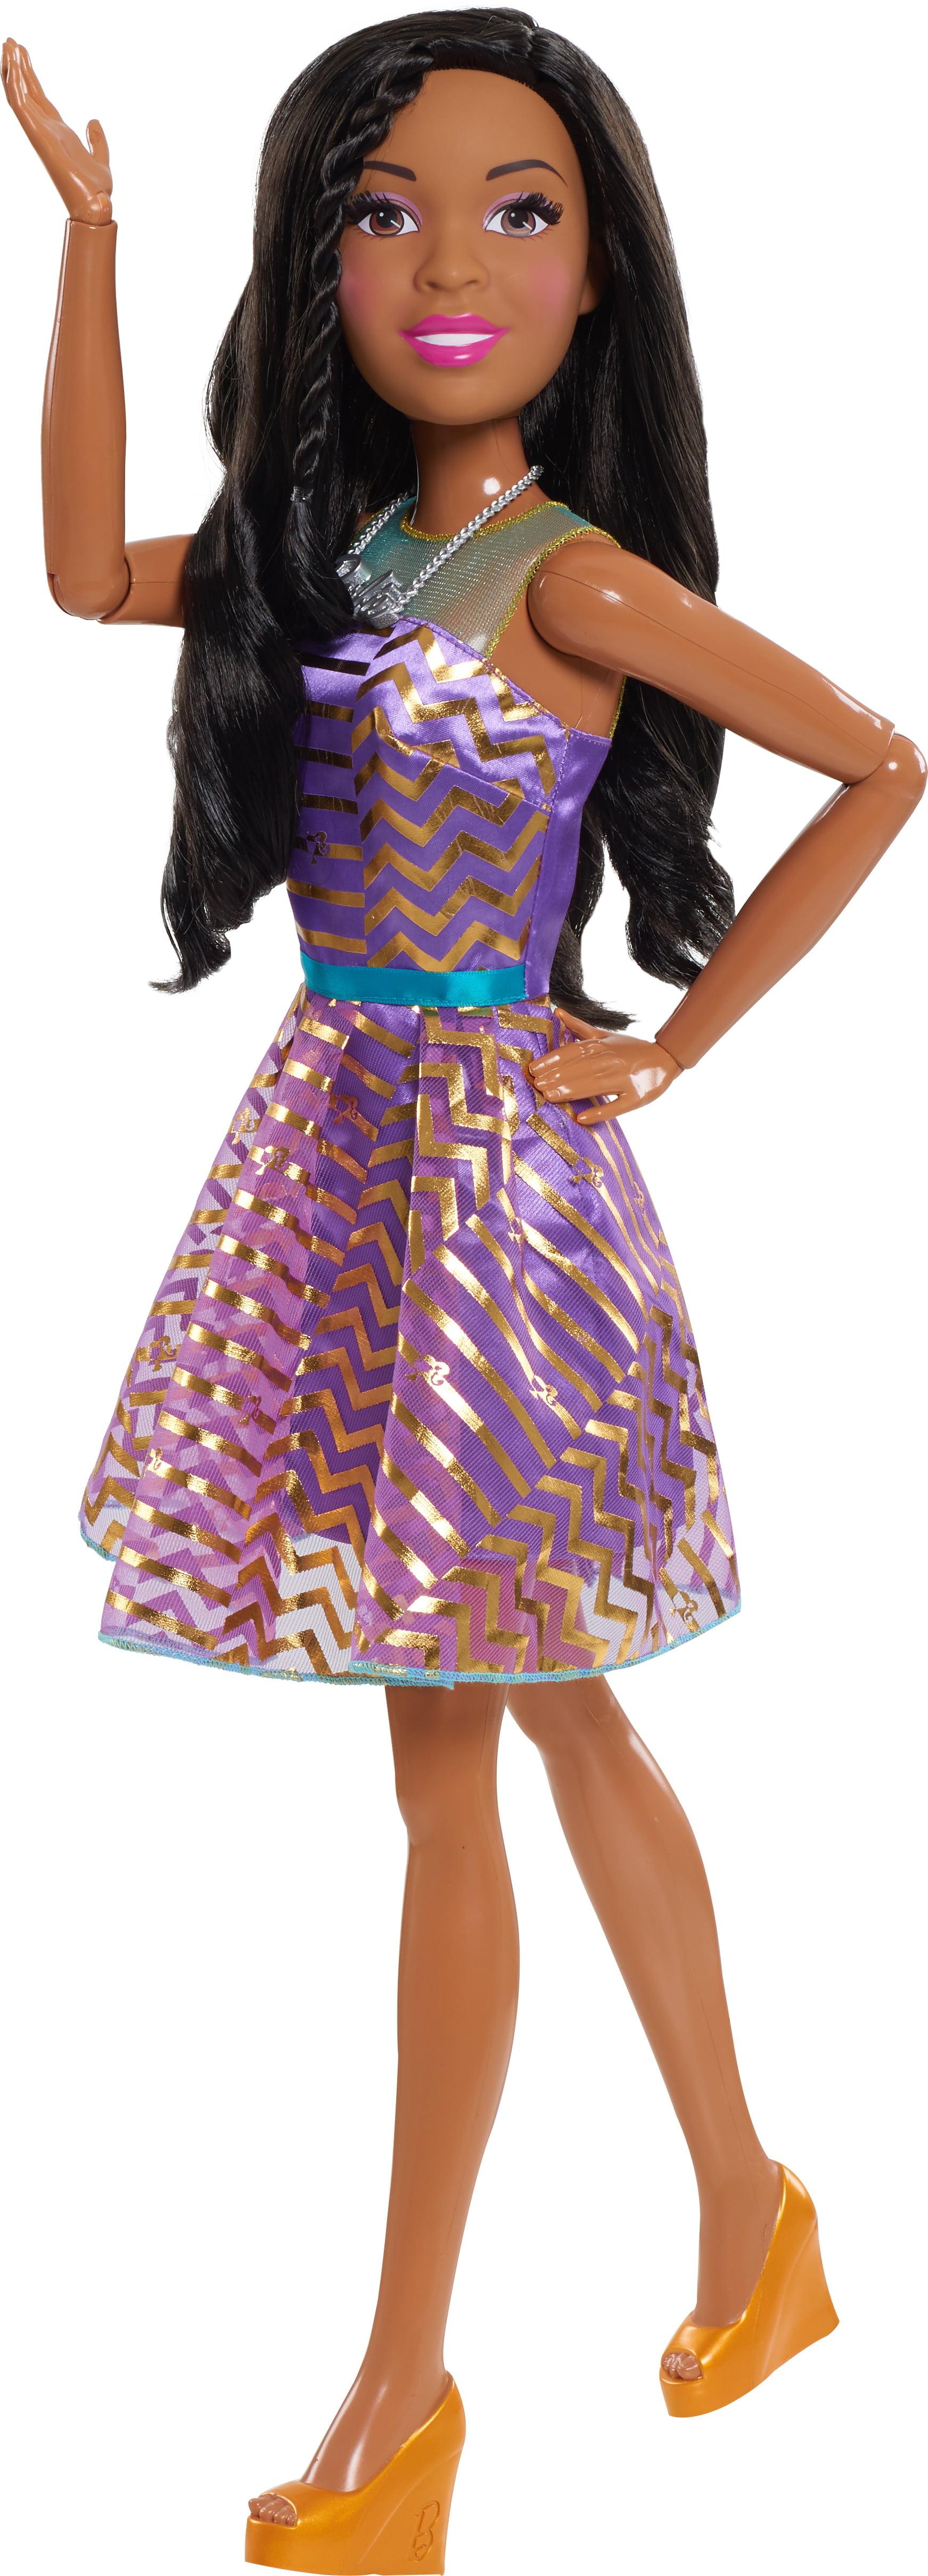 "Barbie 28"" Best Fashion Friend Doll Black Hair by Just Play"